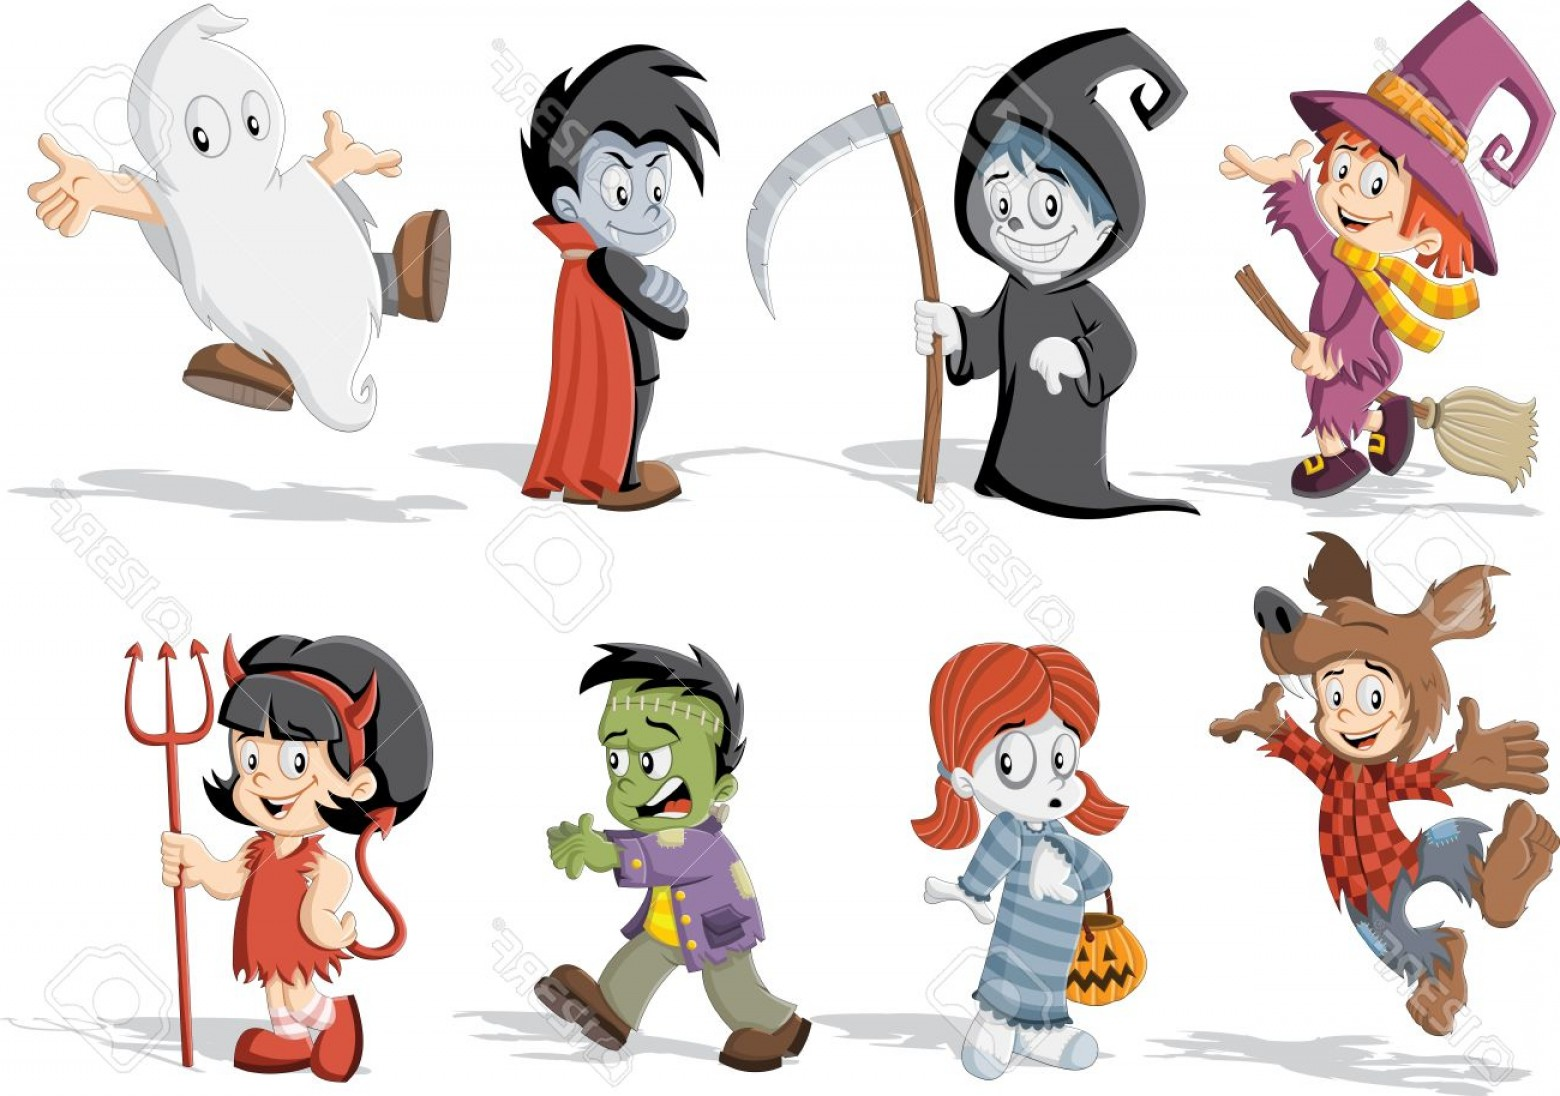 1560x1096 Photostock Vector Cartoon Children Wearing Costumes Of Classic